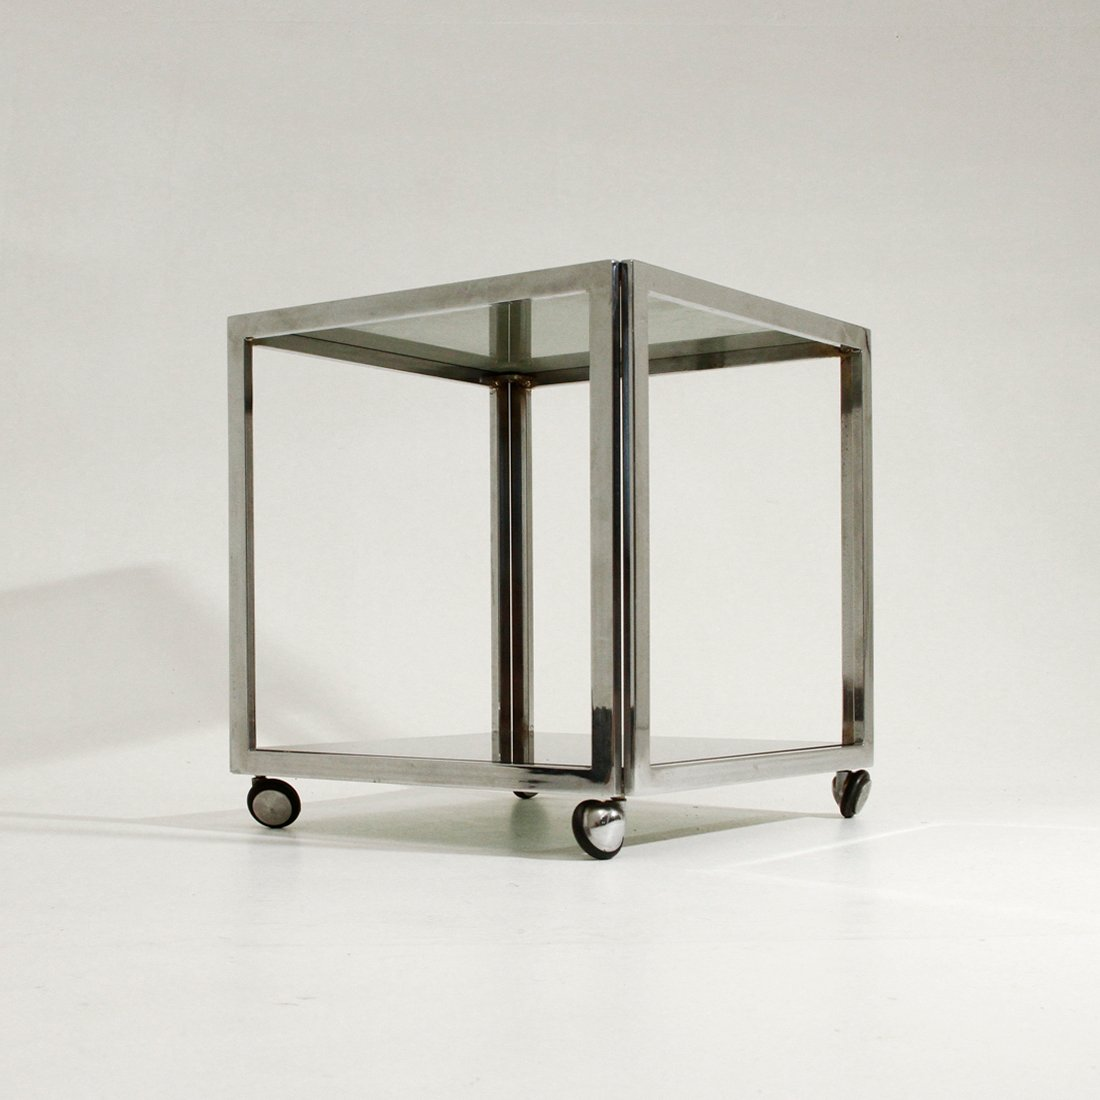 Good Vintage Chromed Metal Side Table On Wheels, 1970s